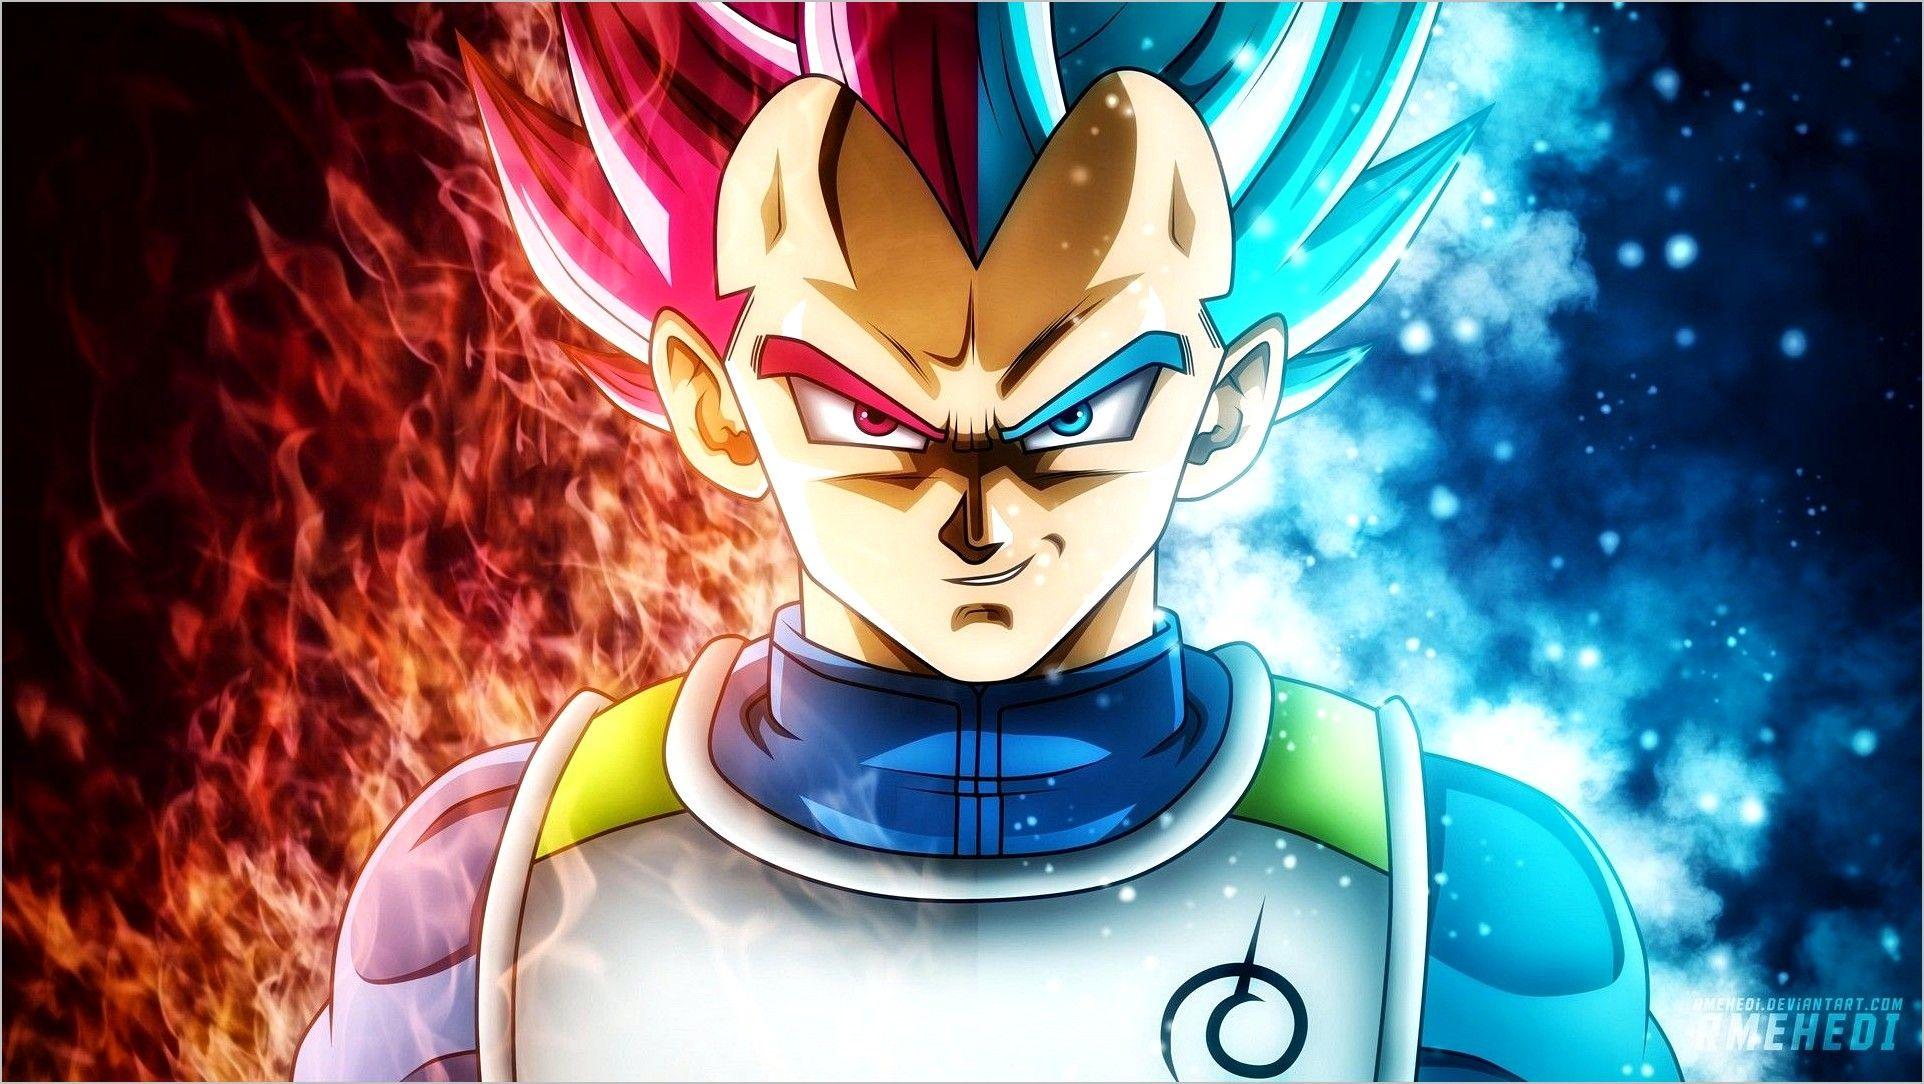 4k Vegeta Ssbe Wallpaper In 2020 Goku Wallpaper Dragon Ball Super Wallpapers Hd Anime Wallpapers